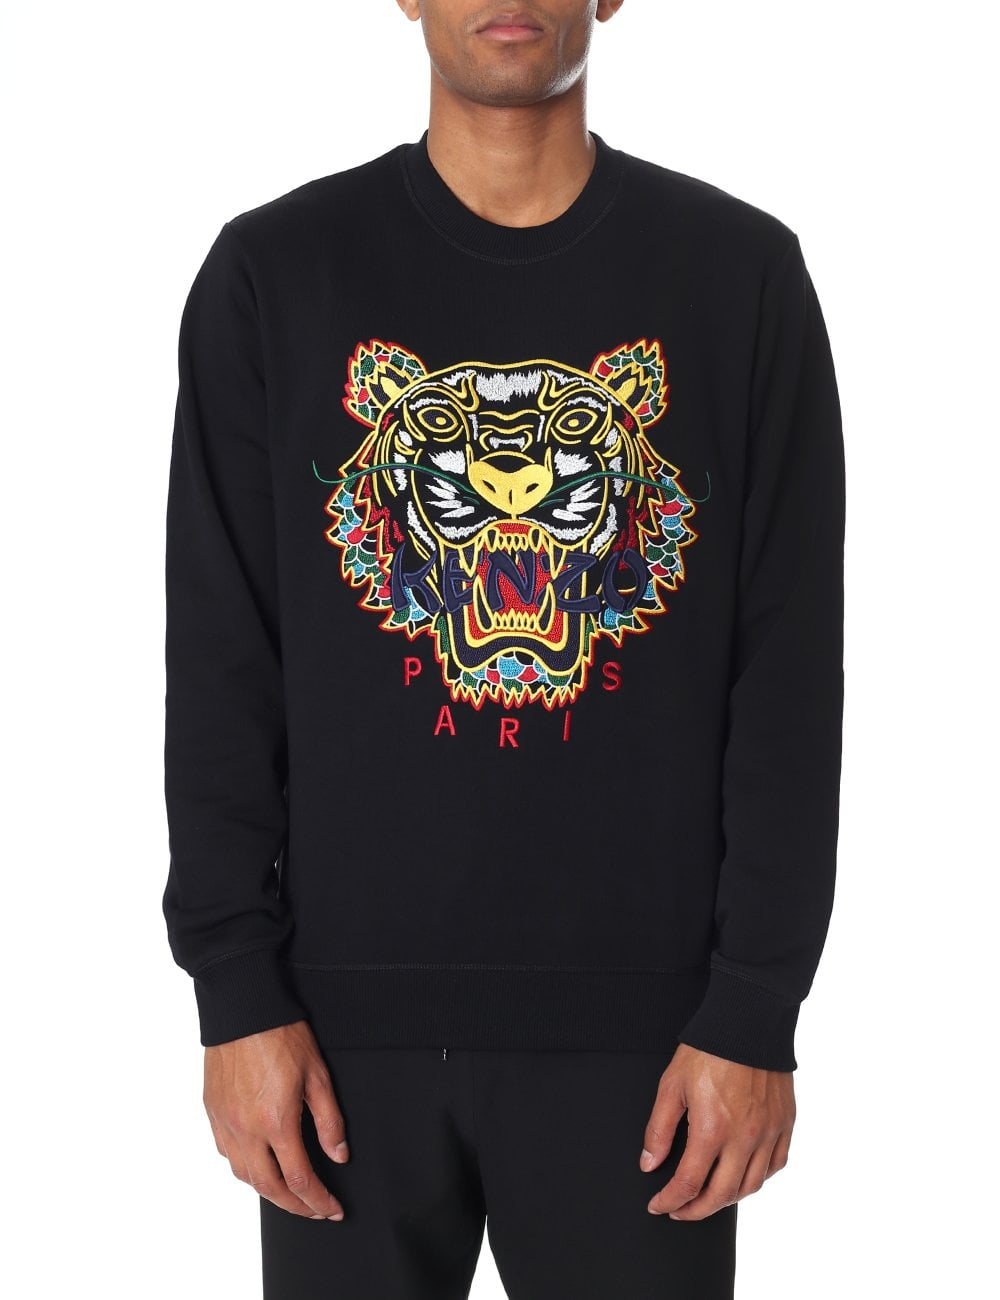 2c8f3d6c48 Kenzo Men's Dragon Tiger Sweatshirt